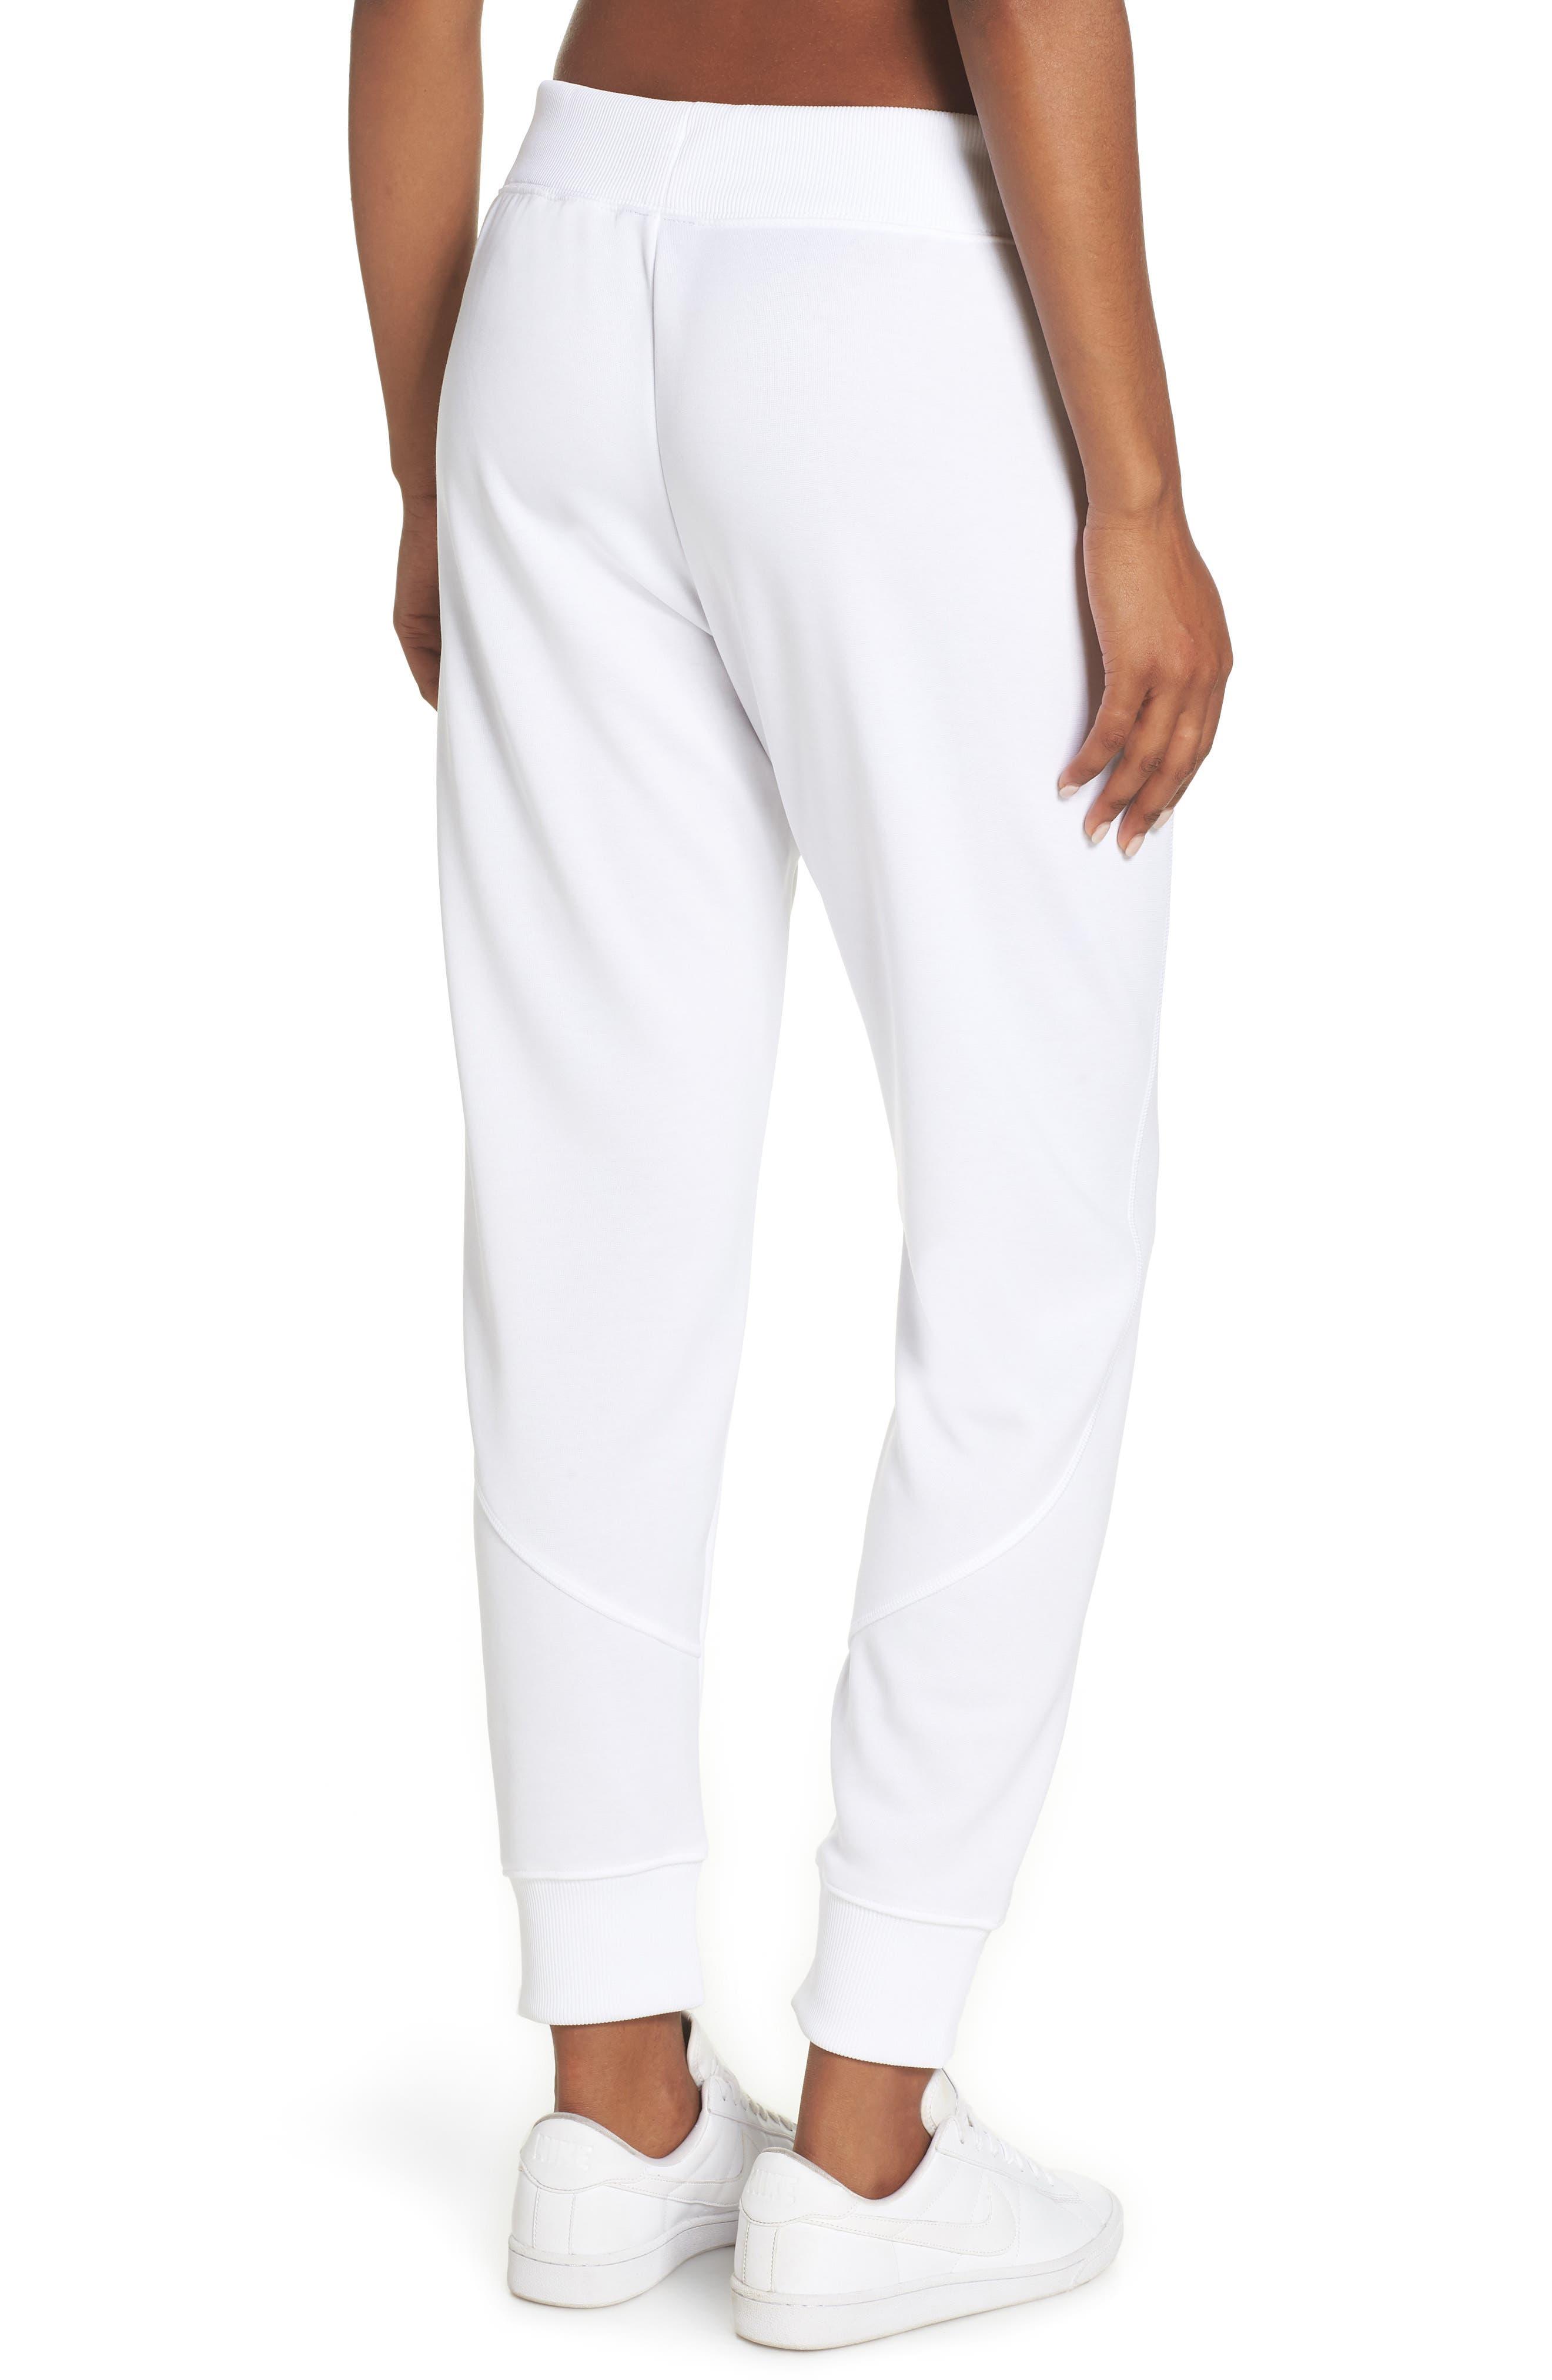 Sportswear Air Jogger Pants,                             Alternate thumbnail 2, color,                             WHITE/ ROSE GOLD/ BLACK